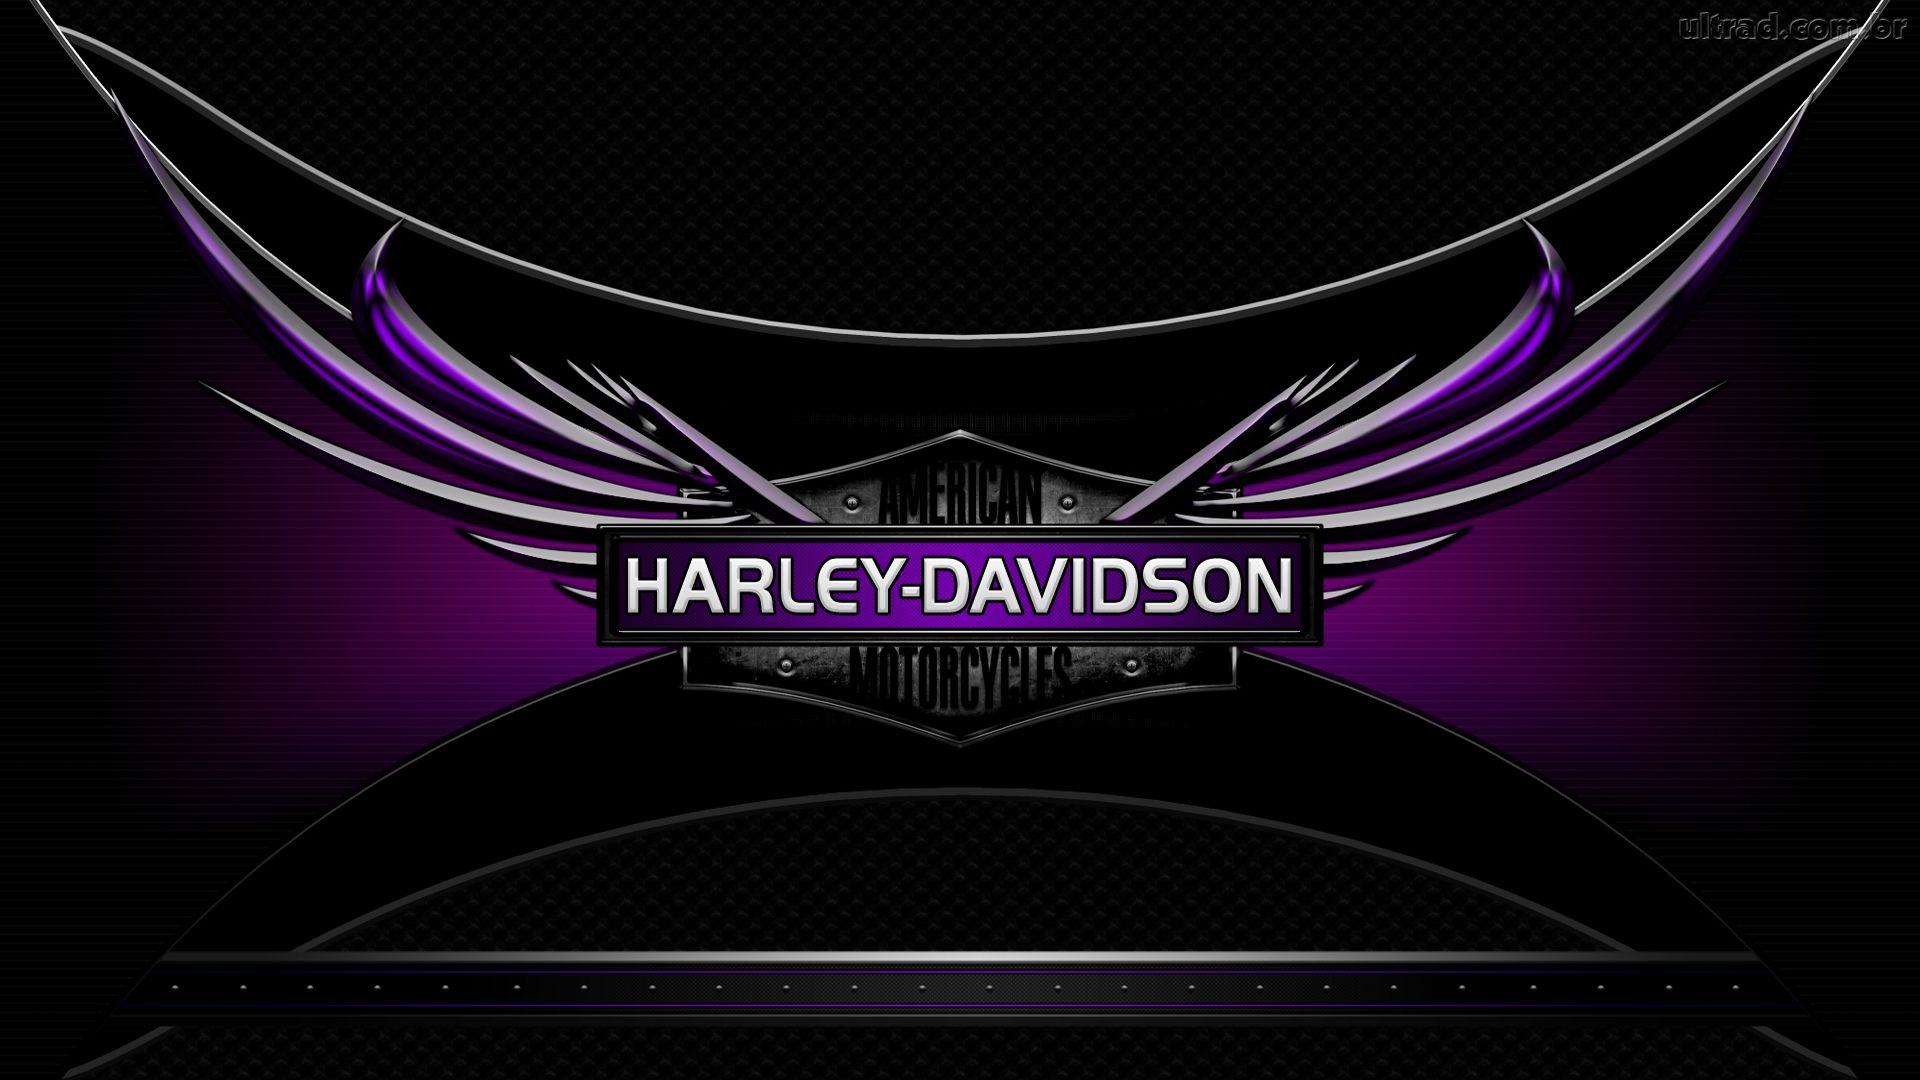 Harley Davidson Logo Wallpaper  WallpaperSafari